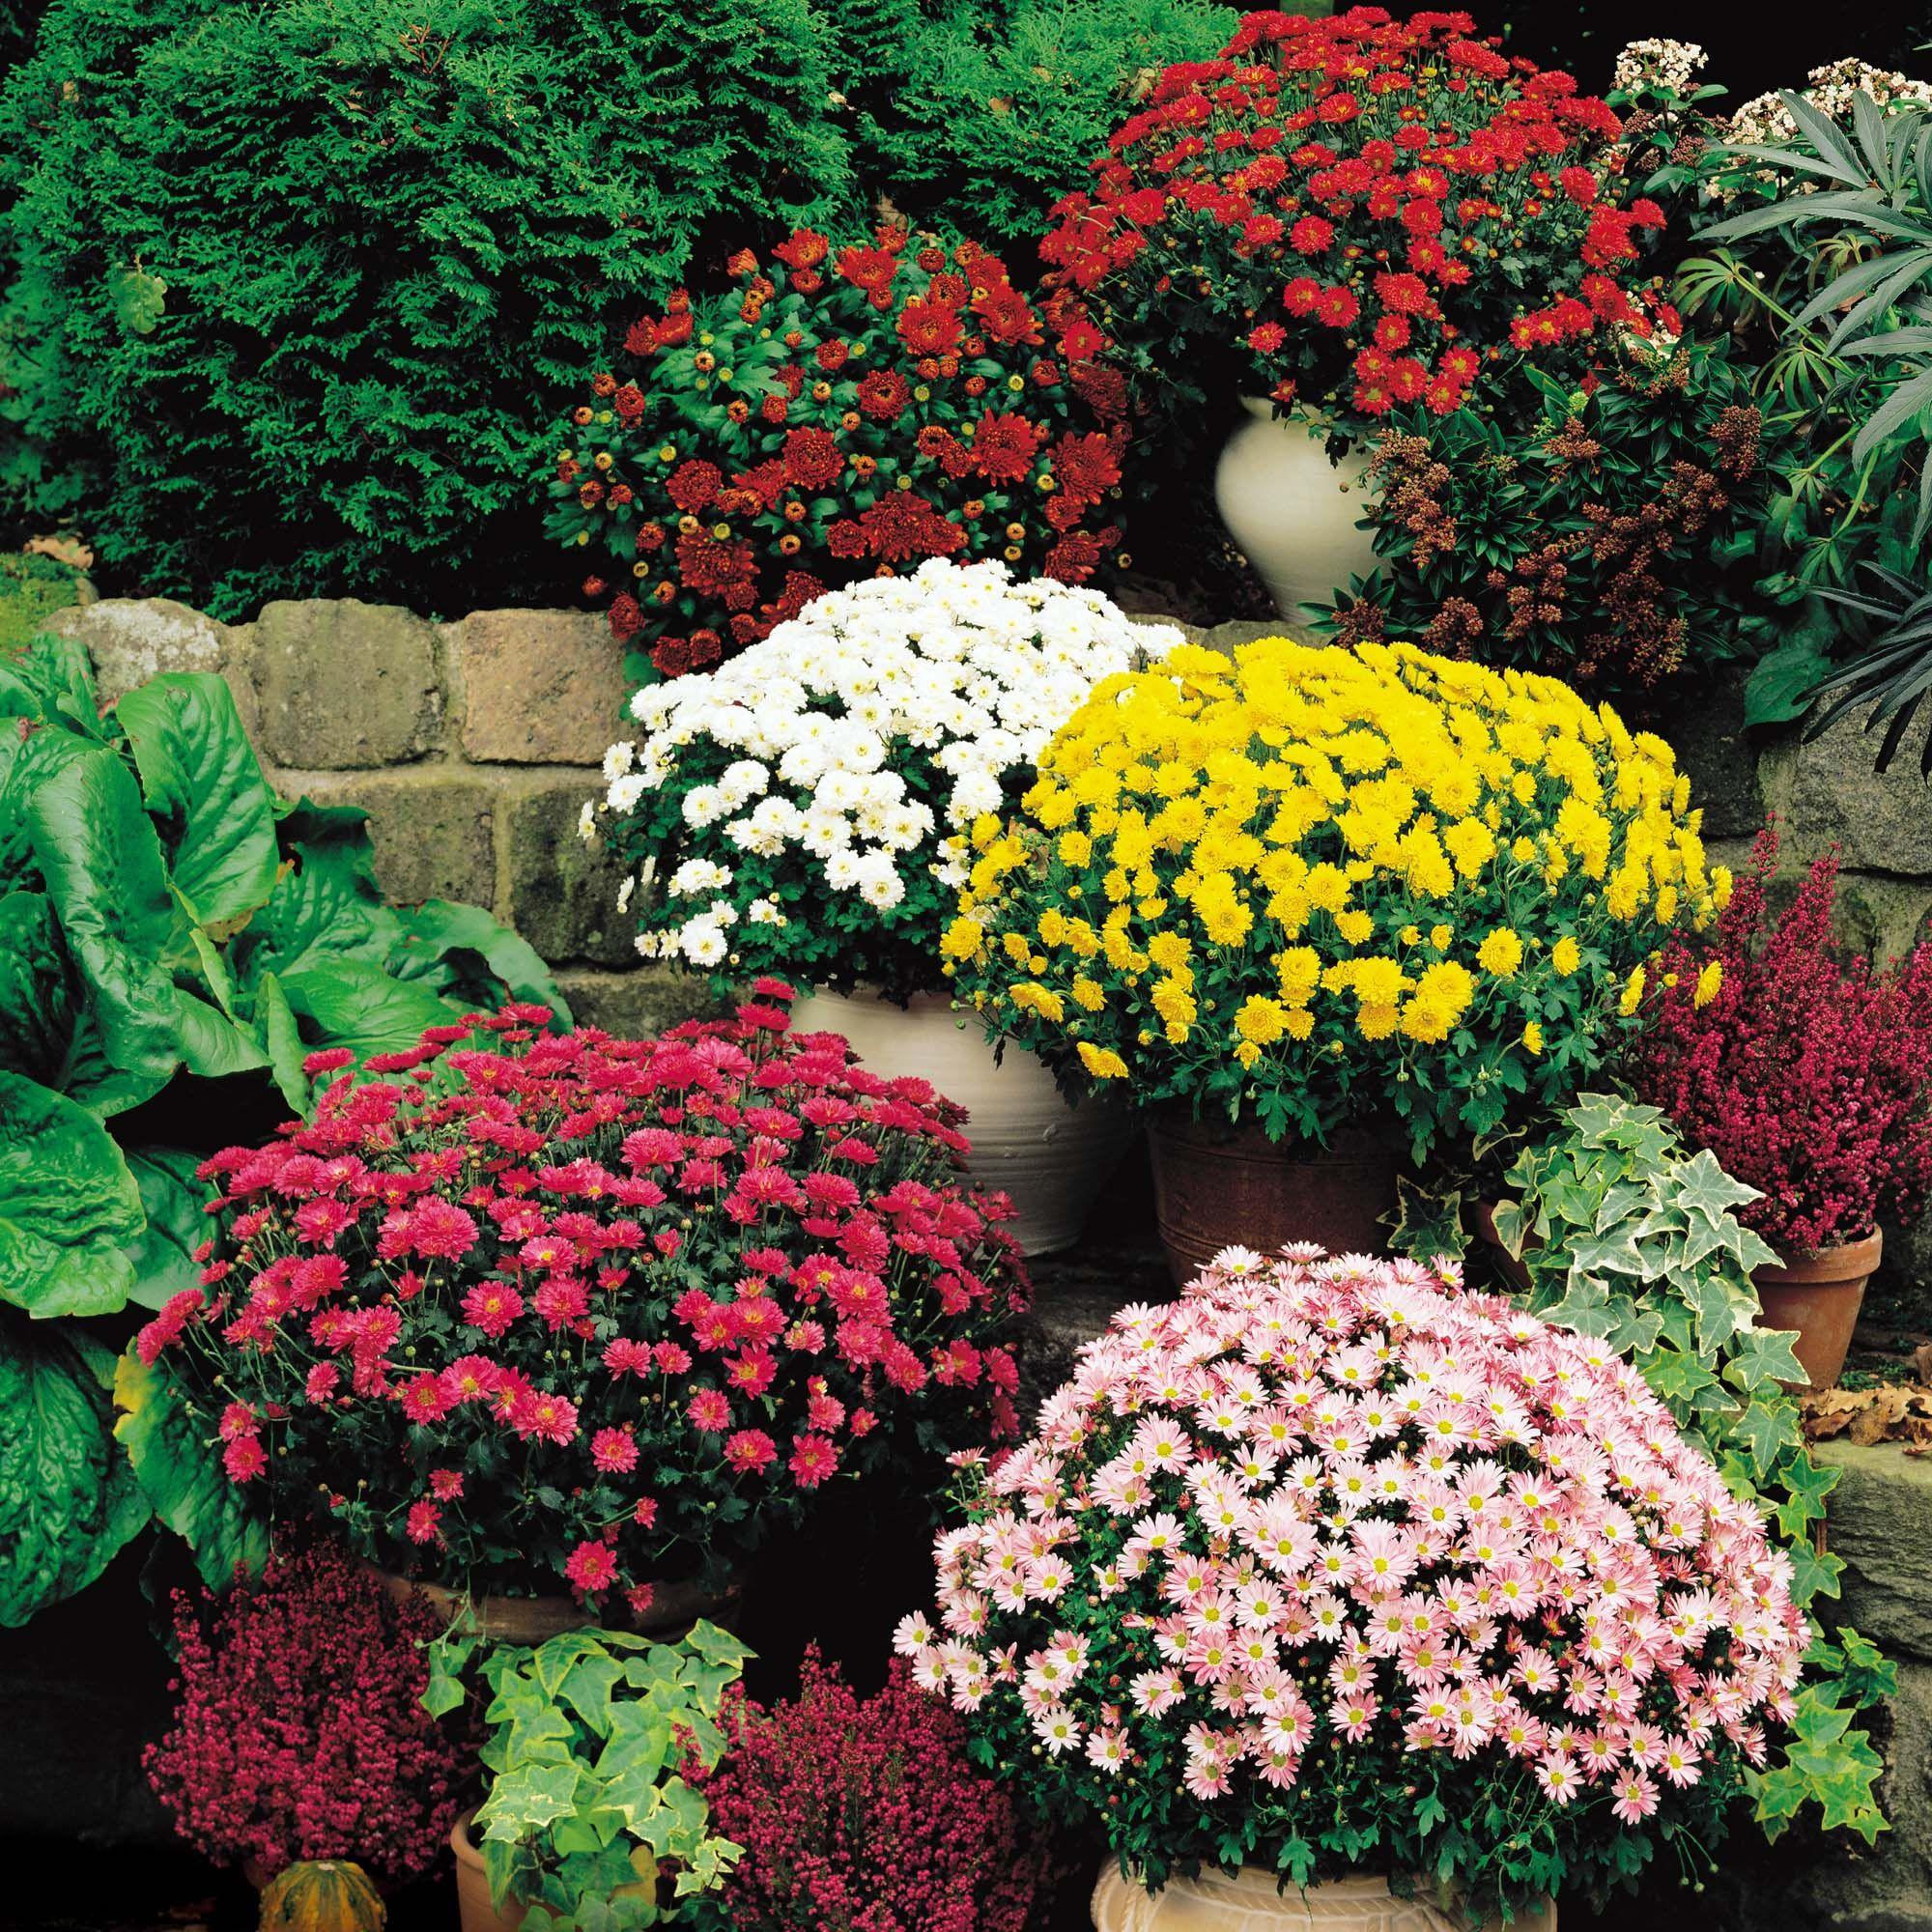 Chrysanthemum Hardy Cushion Mums Hardy Mums Perennials And